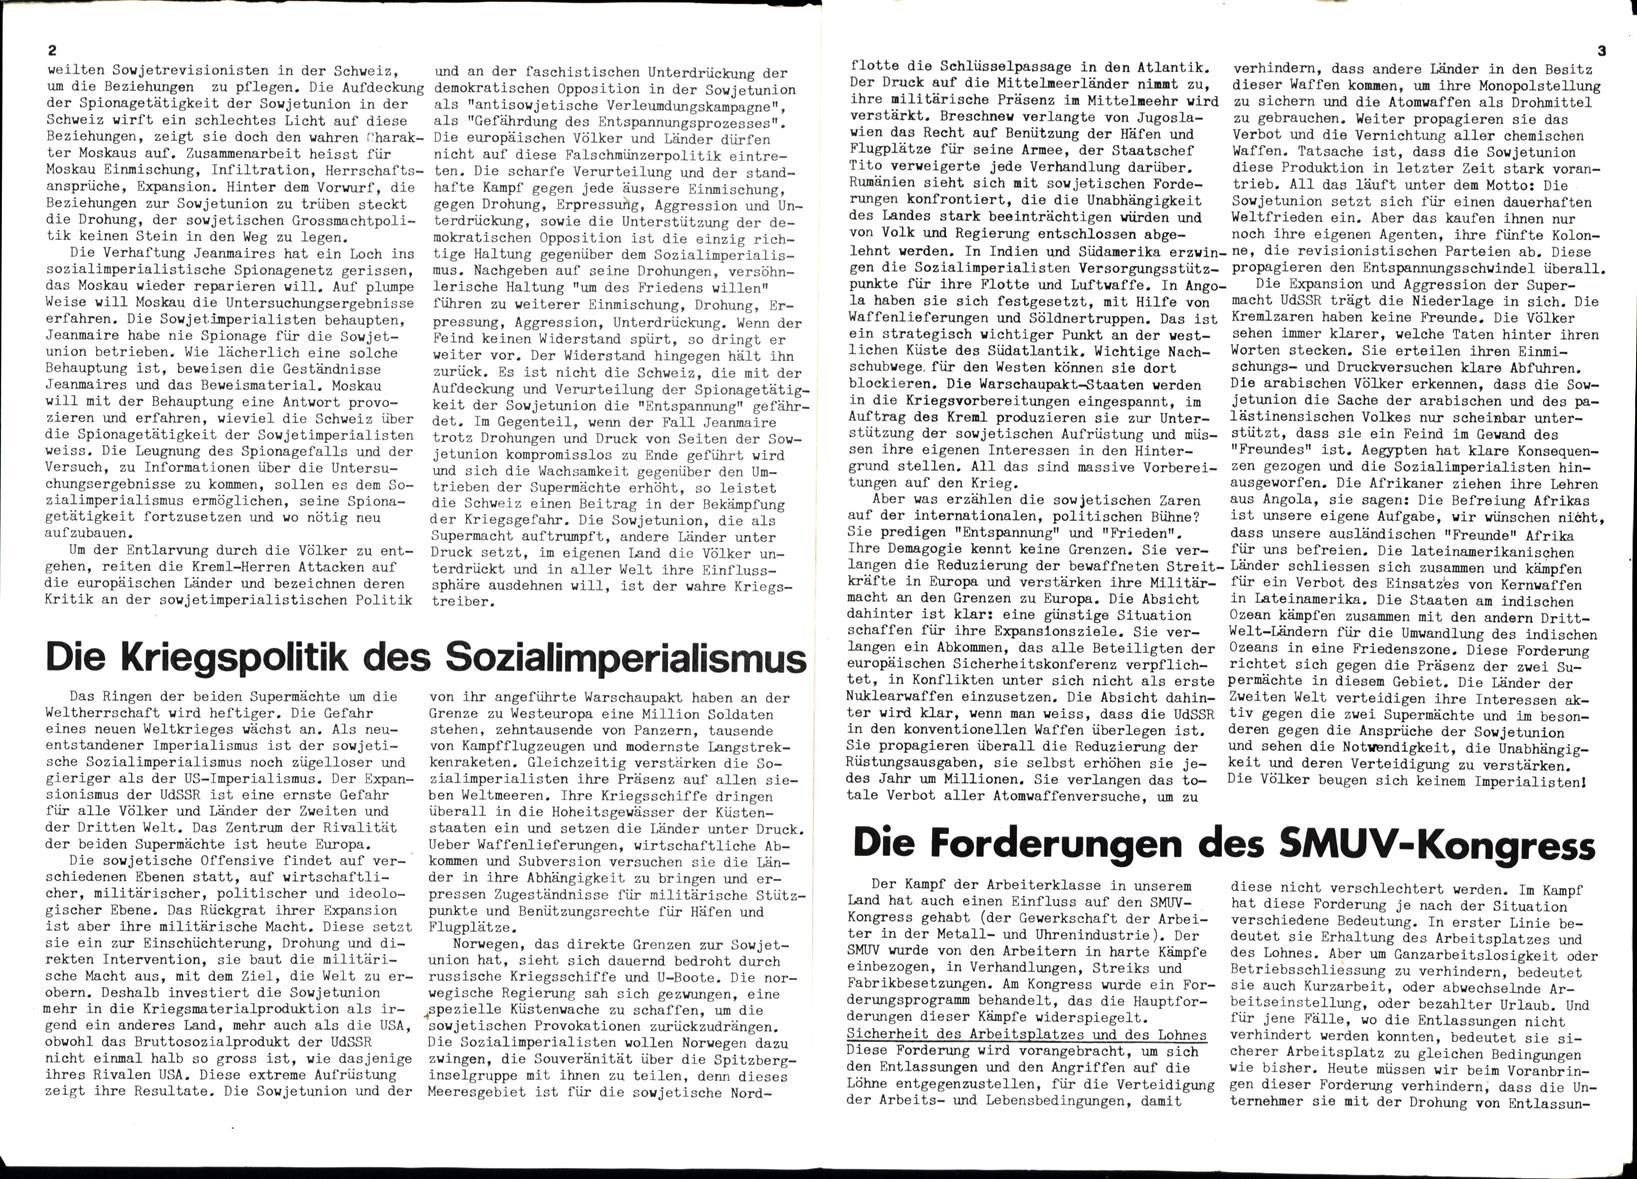 Schweiz_KPSML_Oktober_19770400_109_002